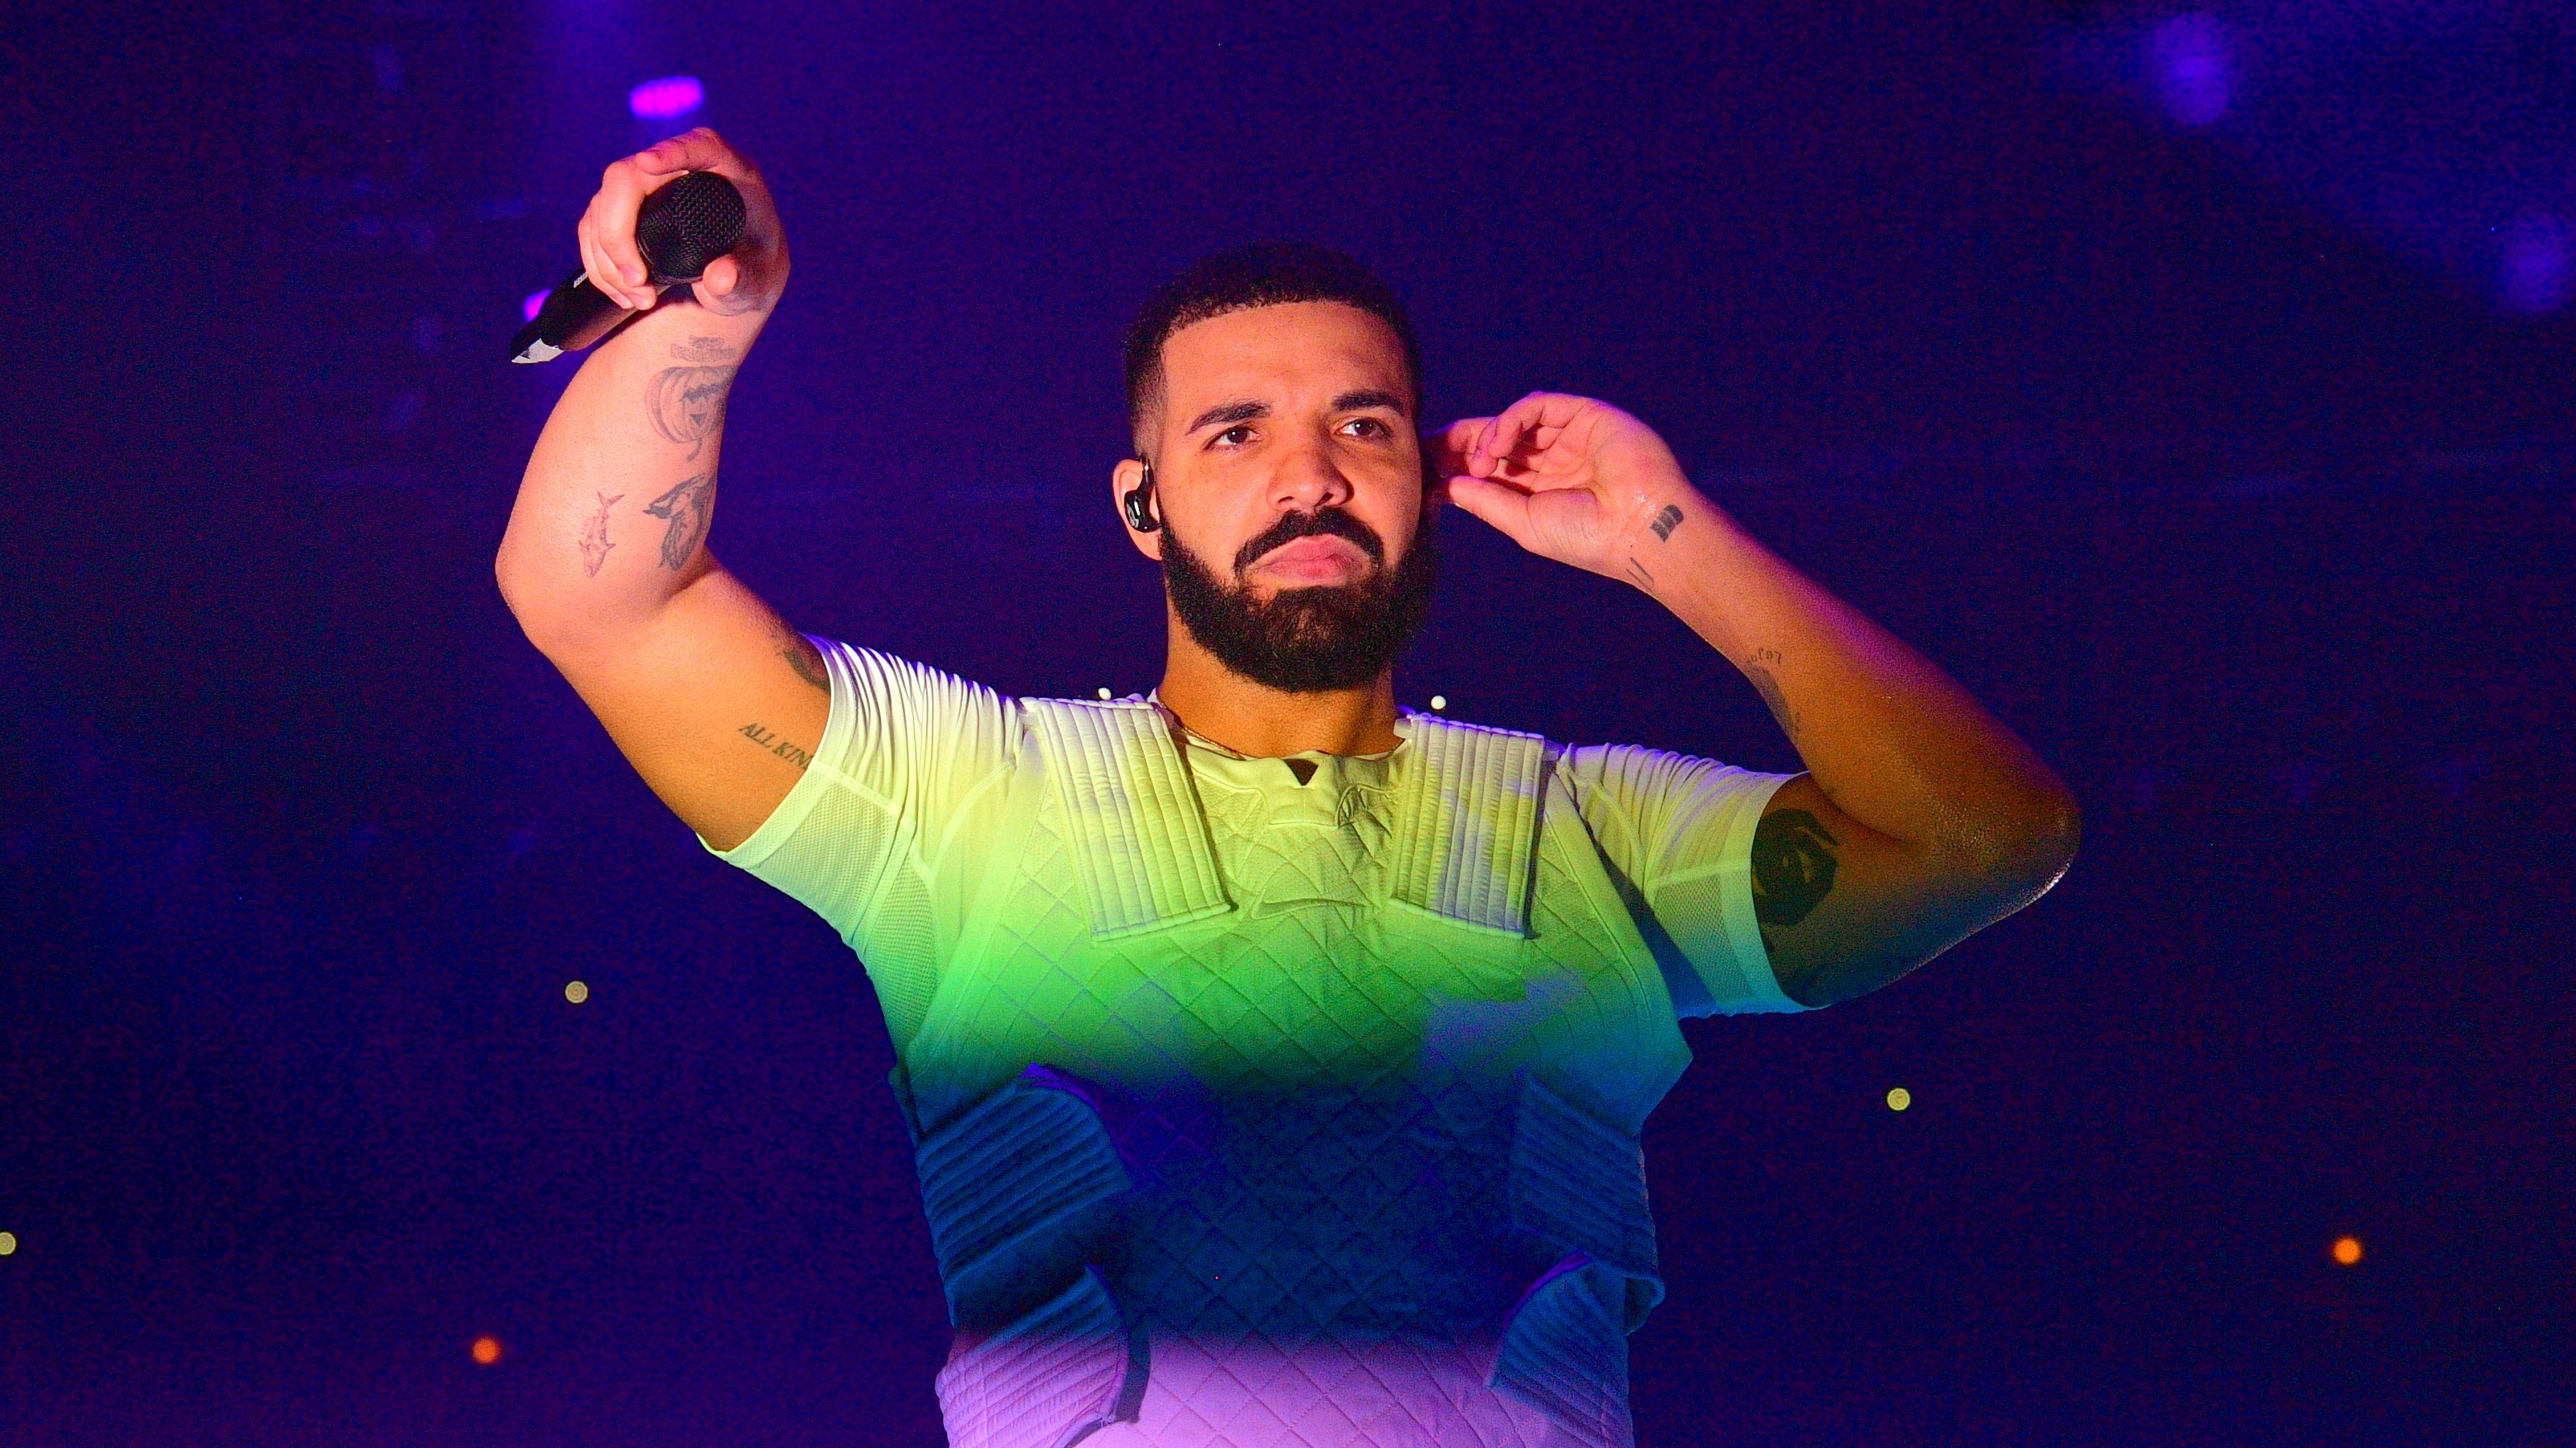 Music Codes For Roblox Drake Gods Plan How Drake Harnessed Tiktok To Push Toosie Slide To No 1 Npr